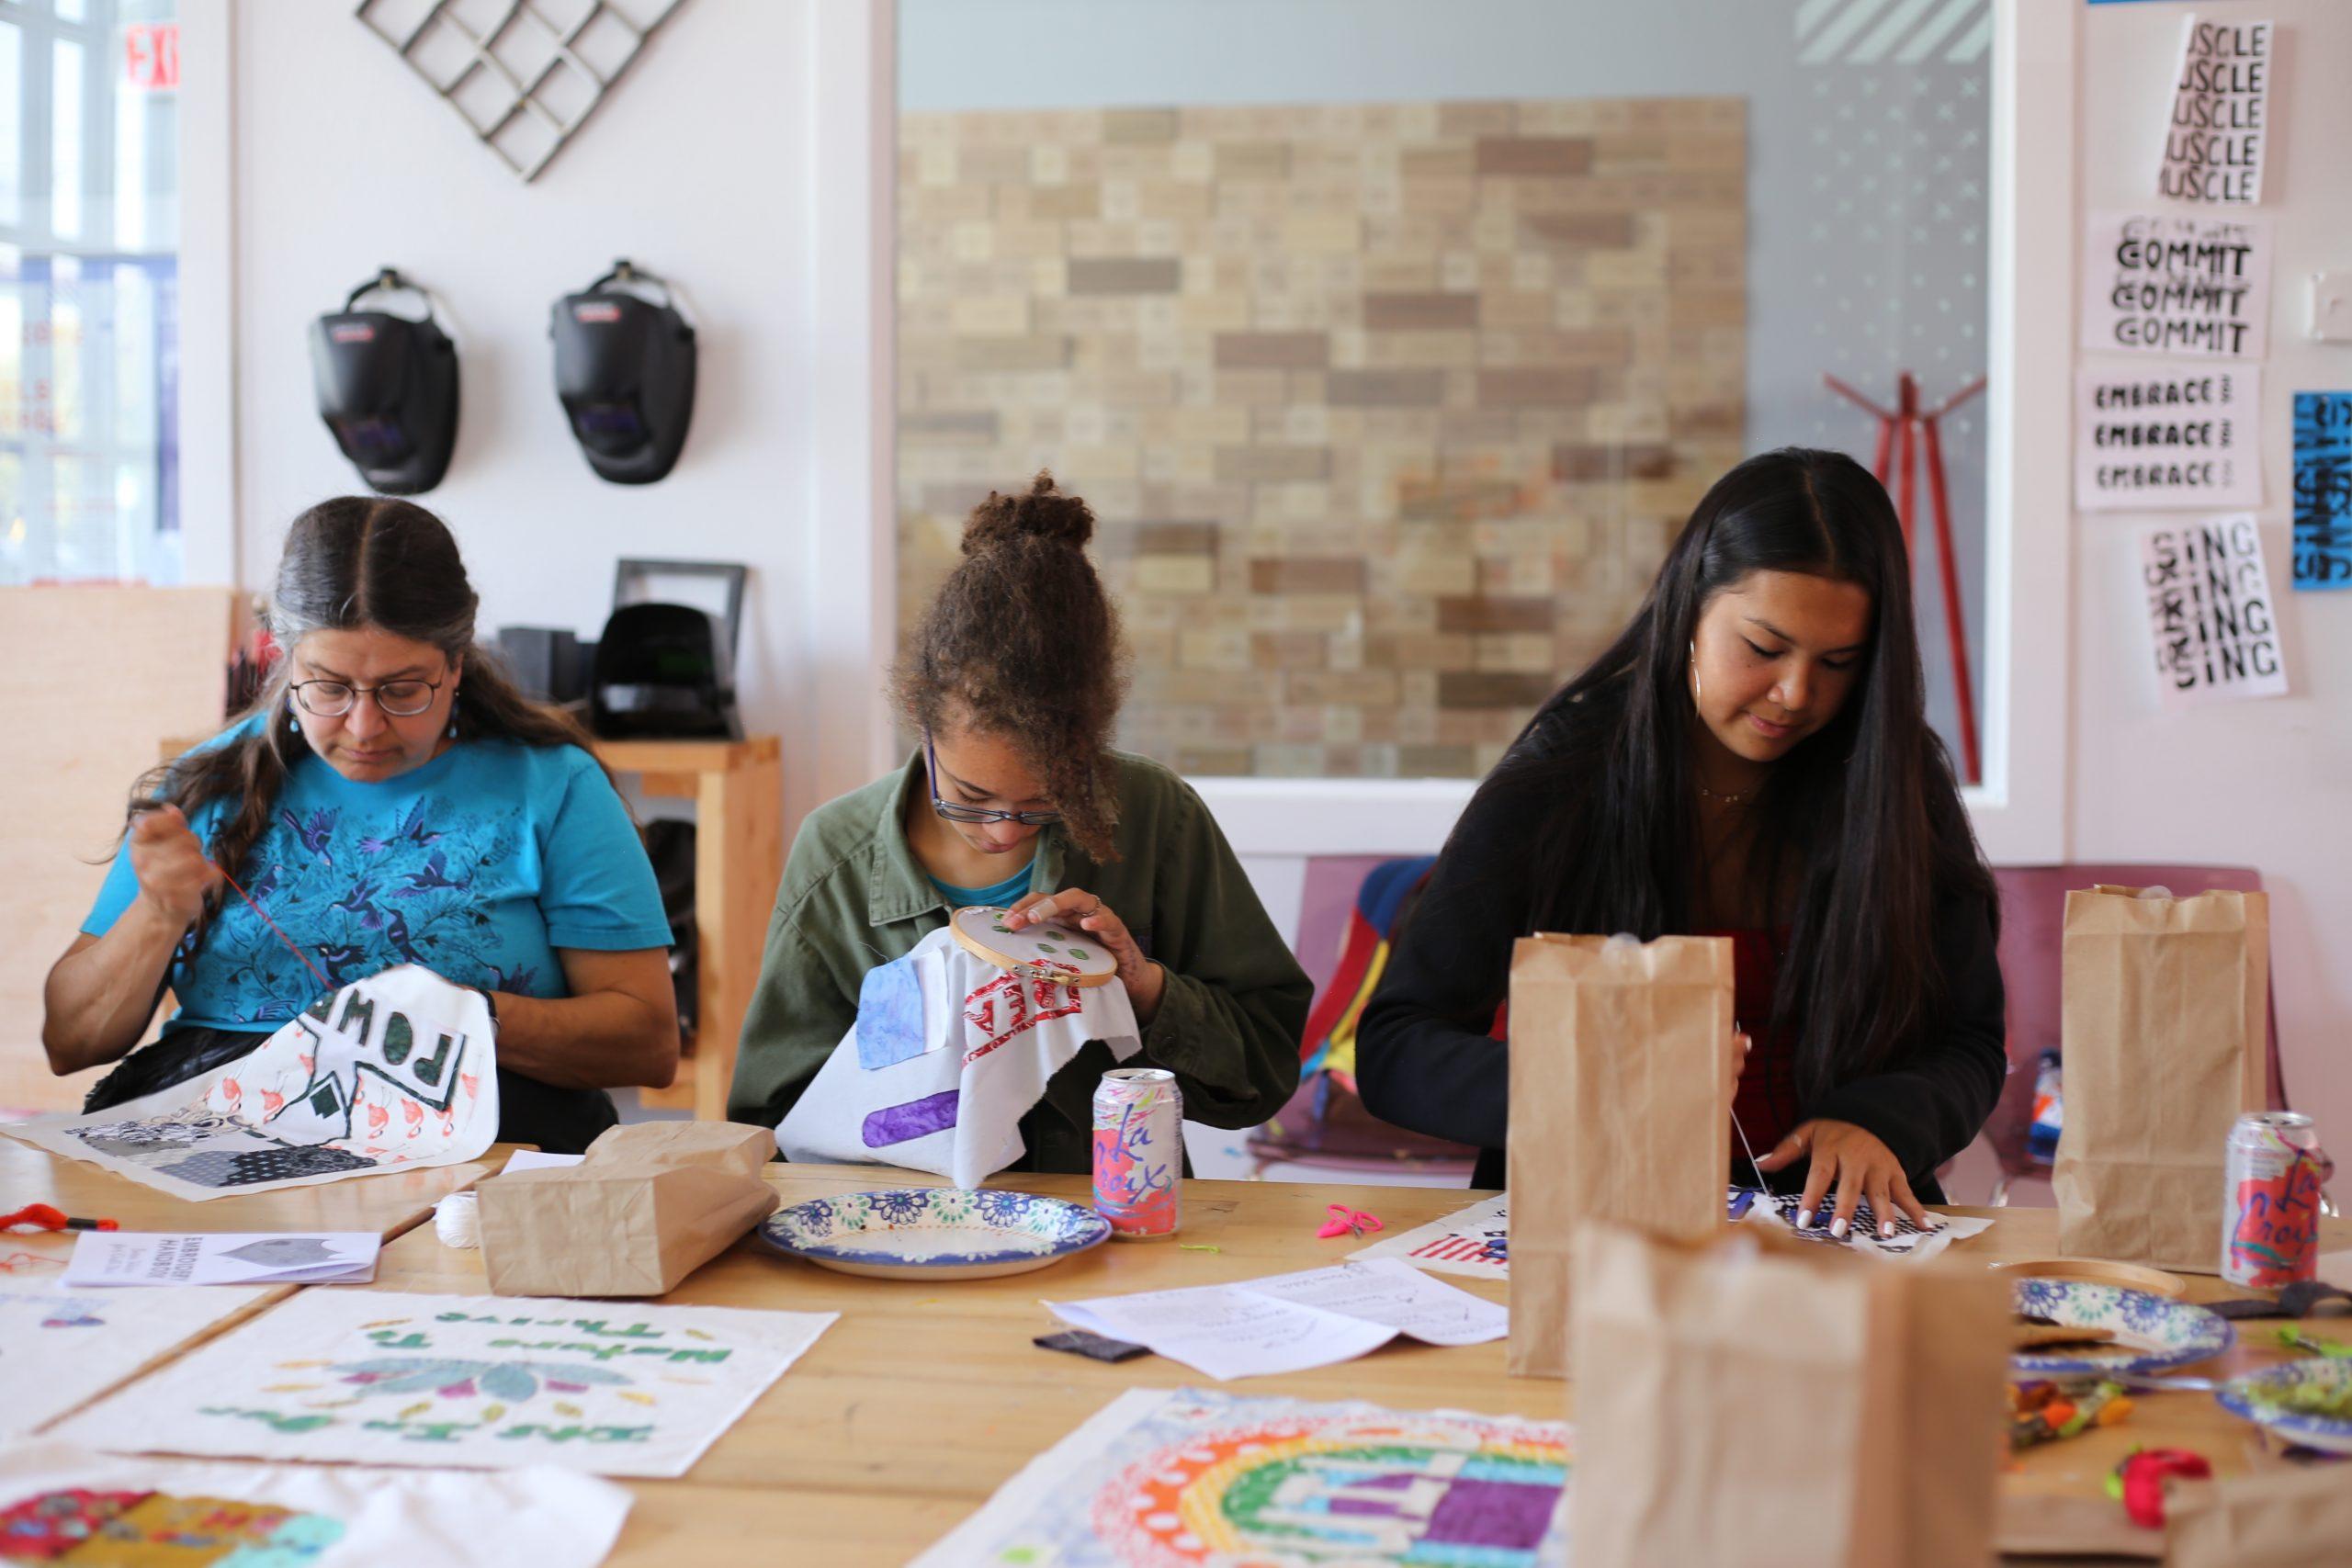 Photograph of three women sewing quilt blocks